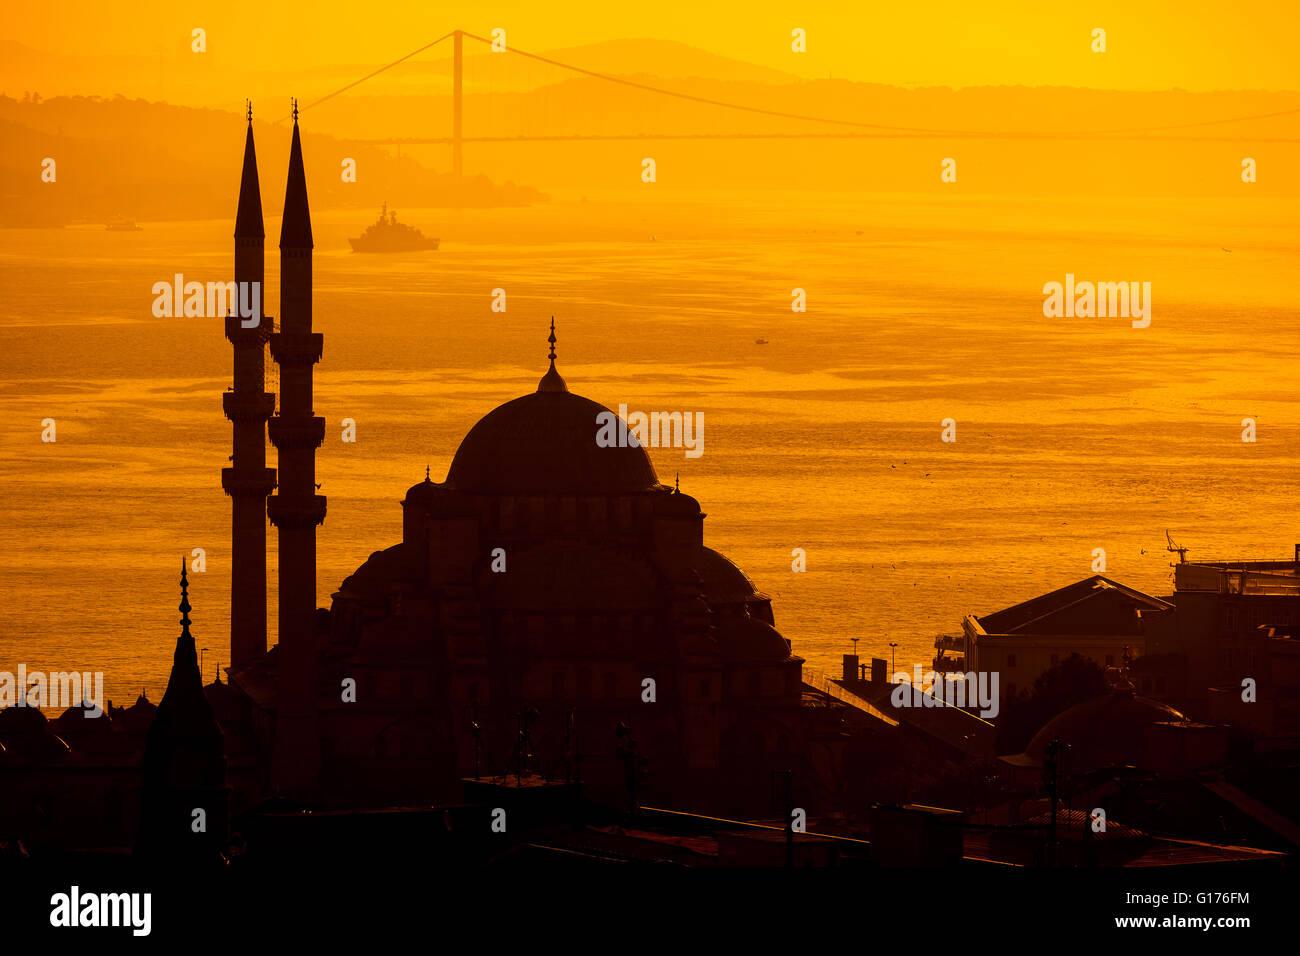 Sihouette moschea, Istanbul Immagini Stock